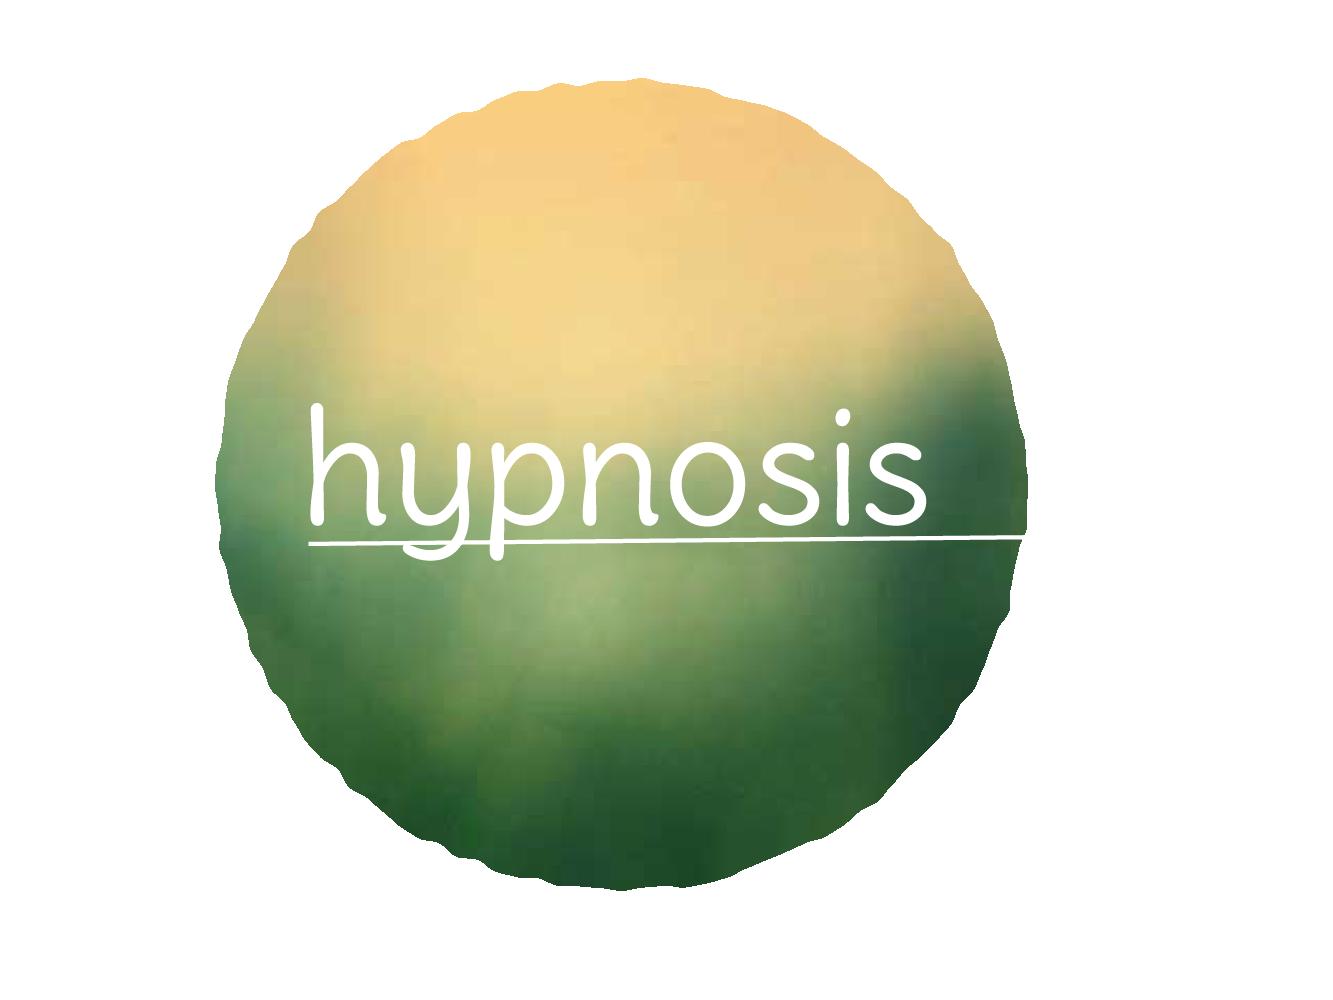 Hypnosis.jpeg